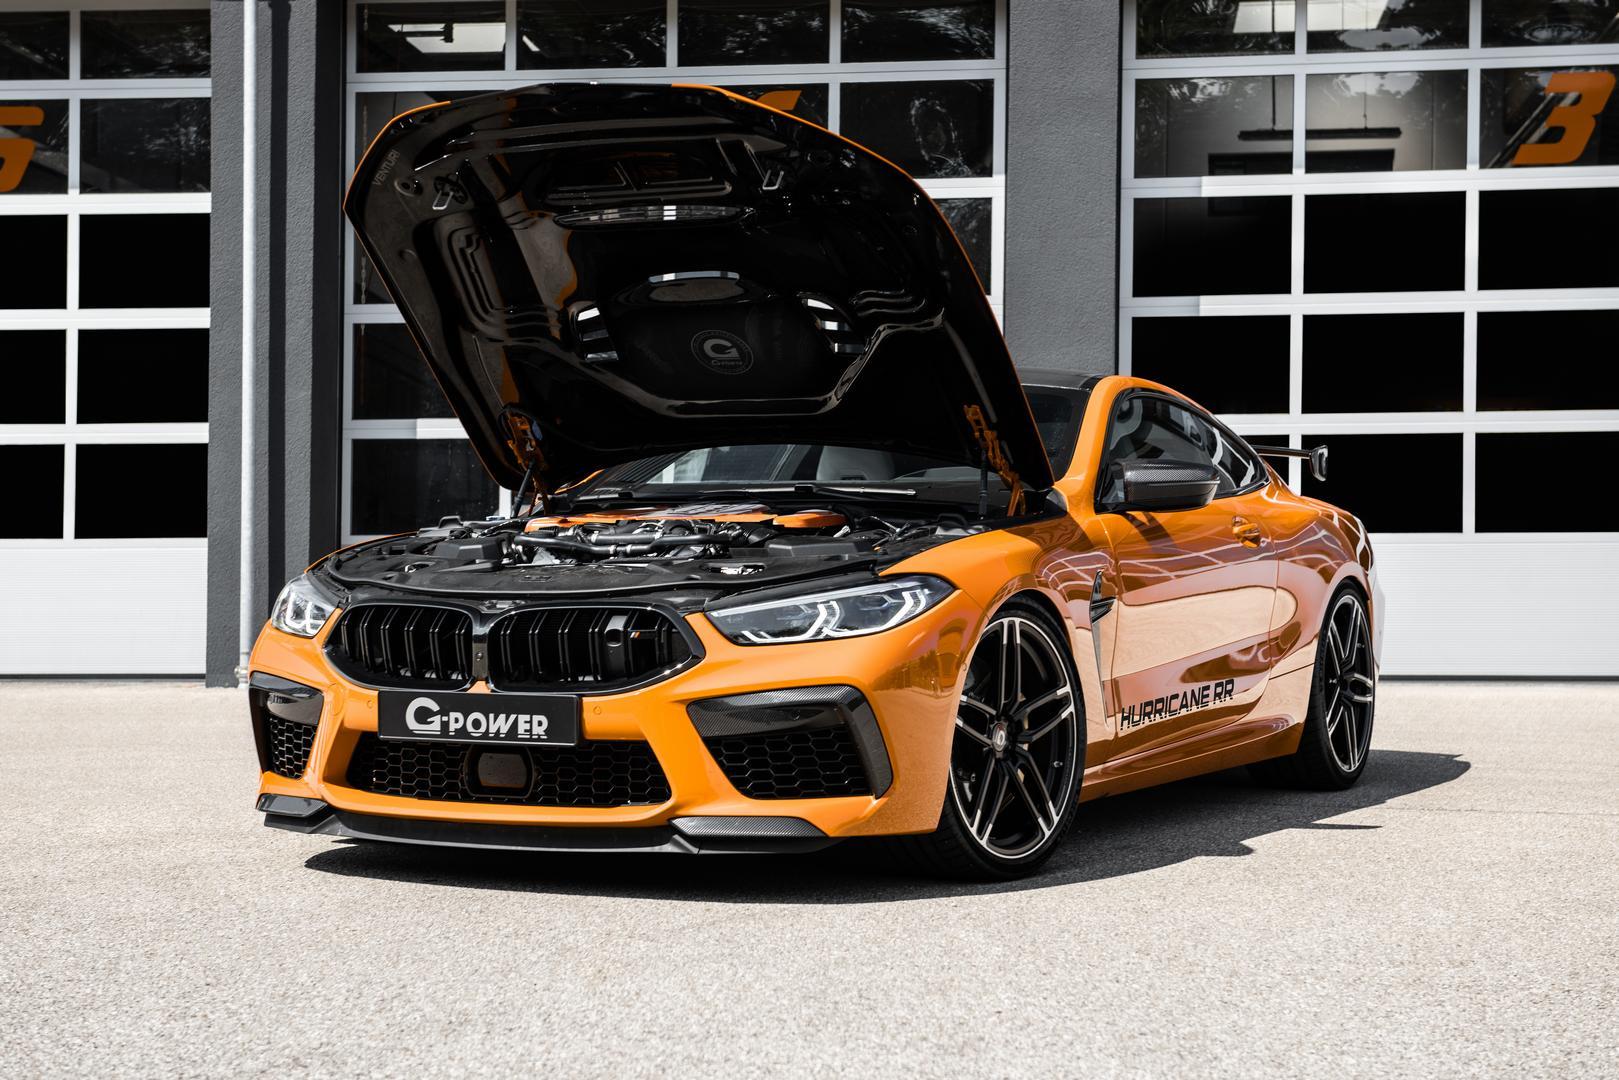 G-Power BMW M8 carbon